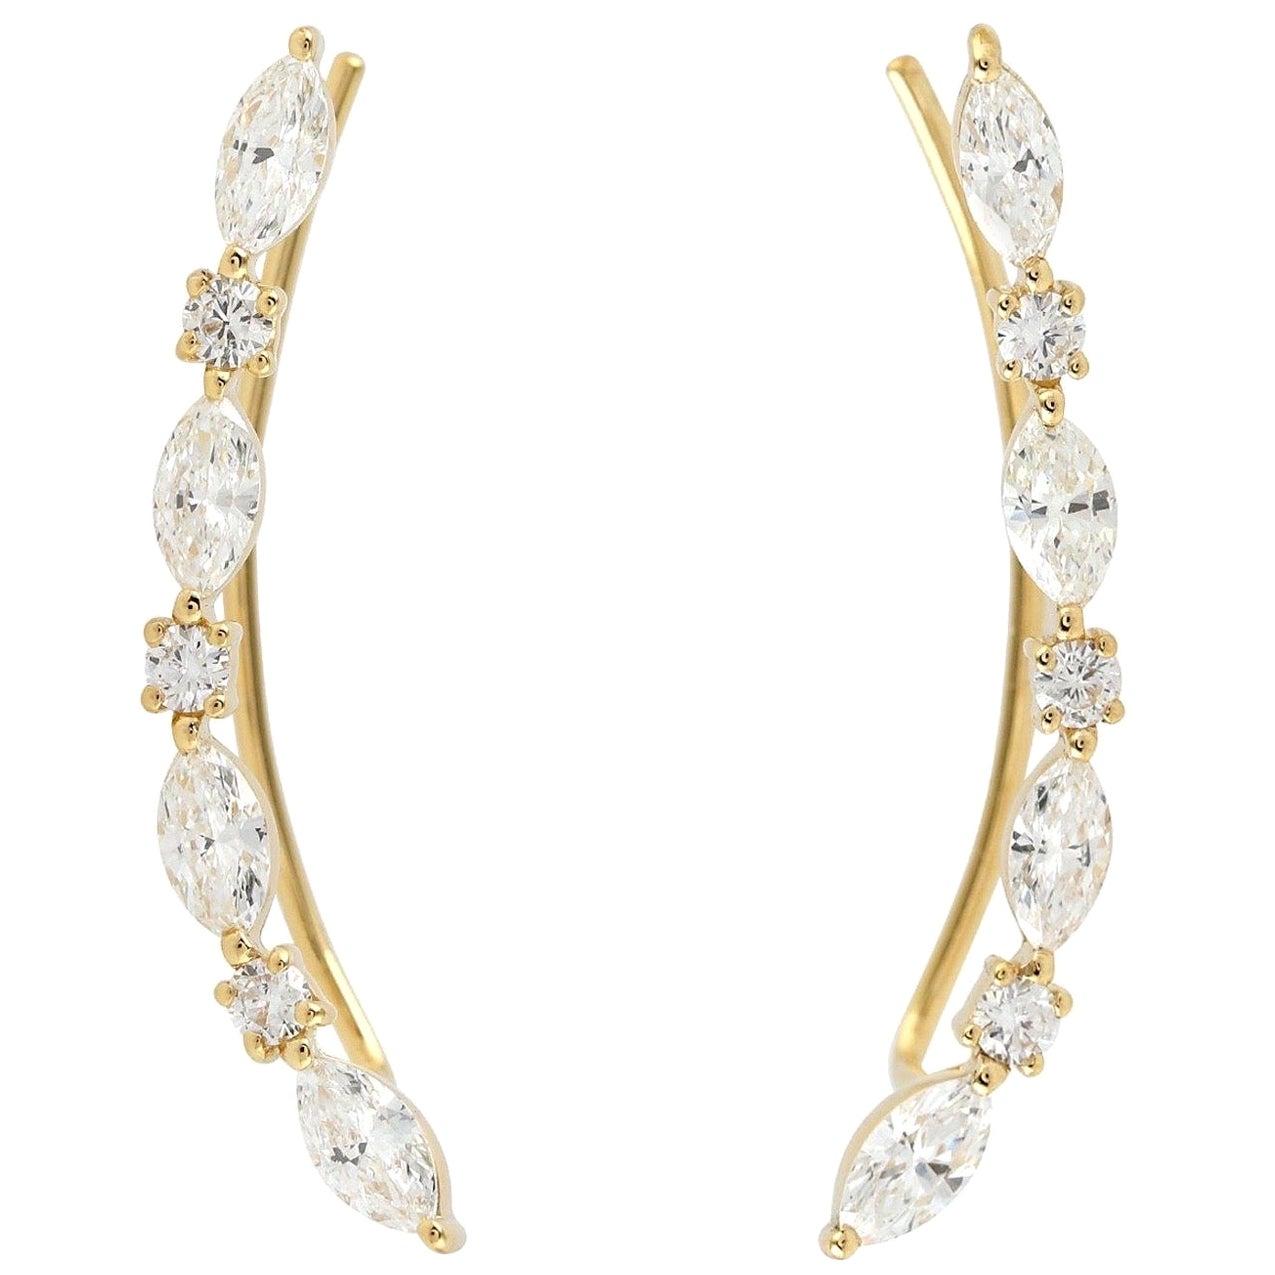 18 Karat Diamond Ear Climbers Earrings